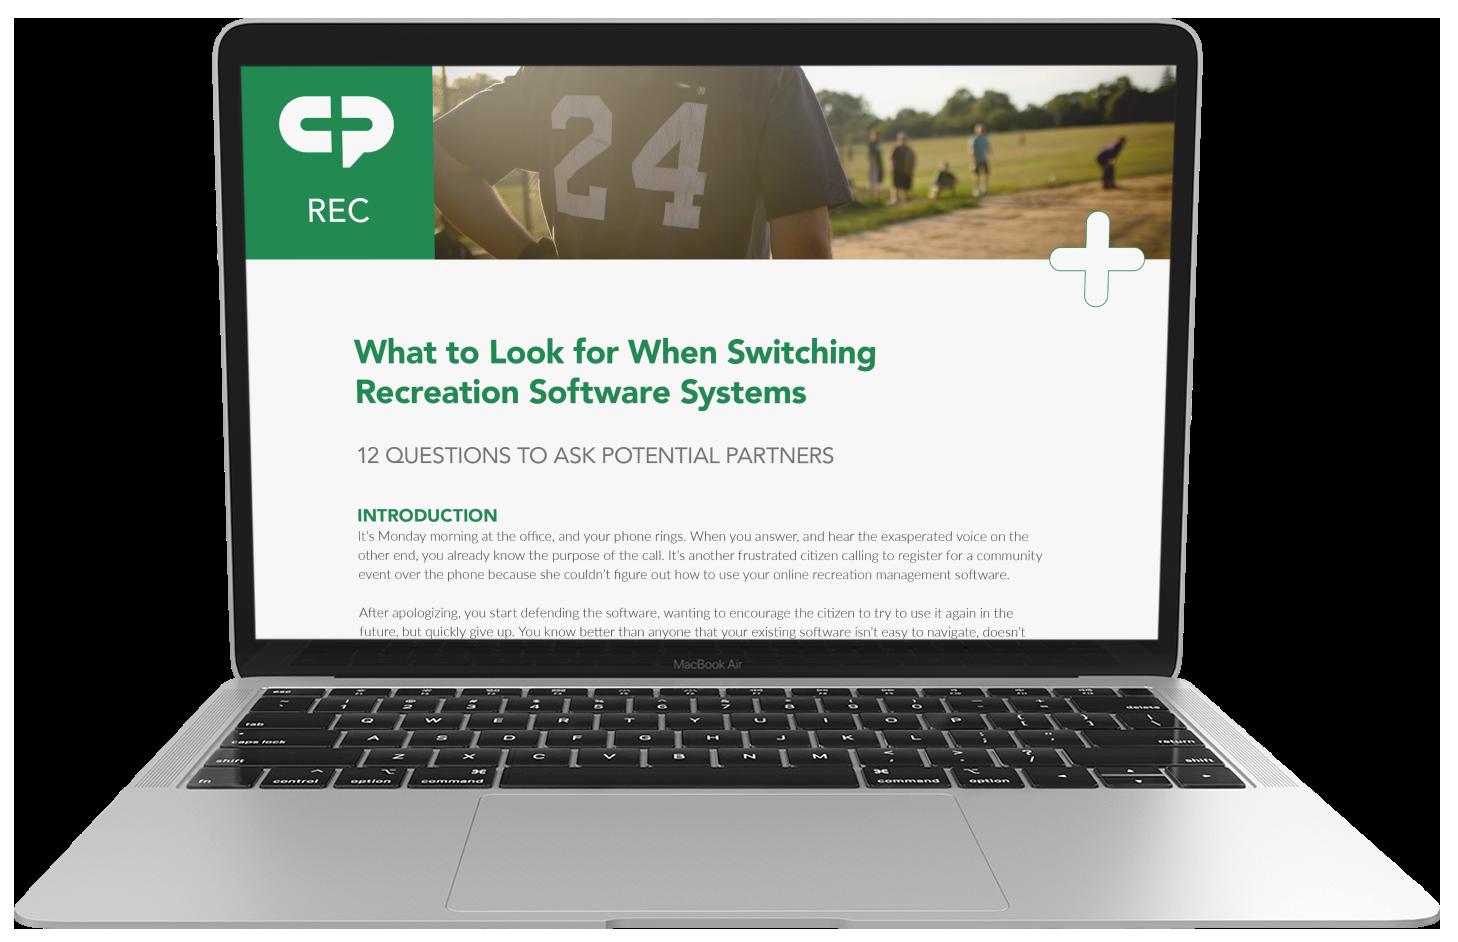 https://cdn2.hubspot.net/hubfs/158743/What_to_Look_For_When_Switching_Rec_Software_PlaceIt_Crop.png